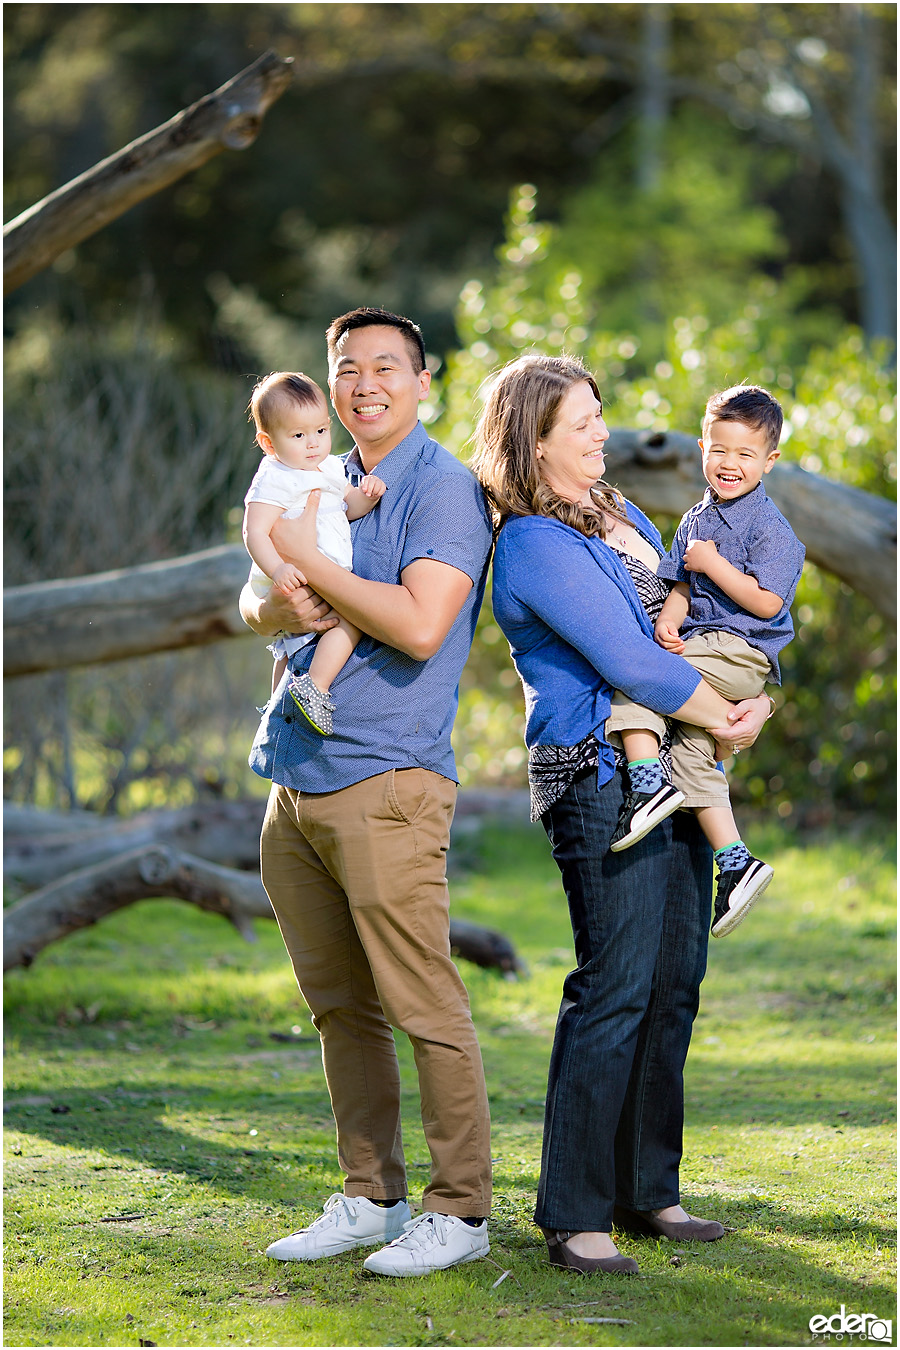 Spring Mini Portrait Session - family photo.